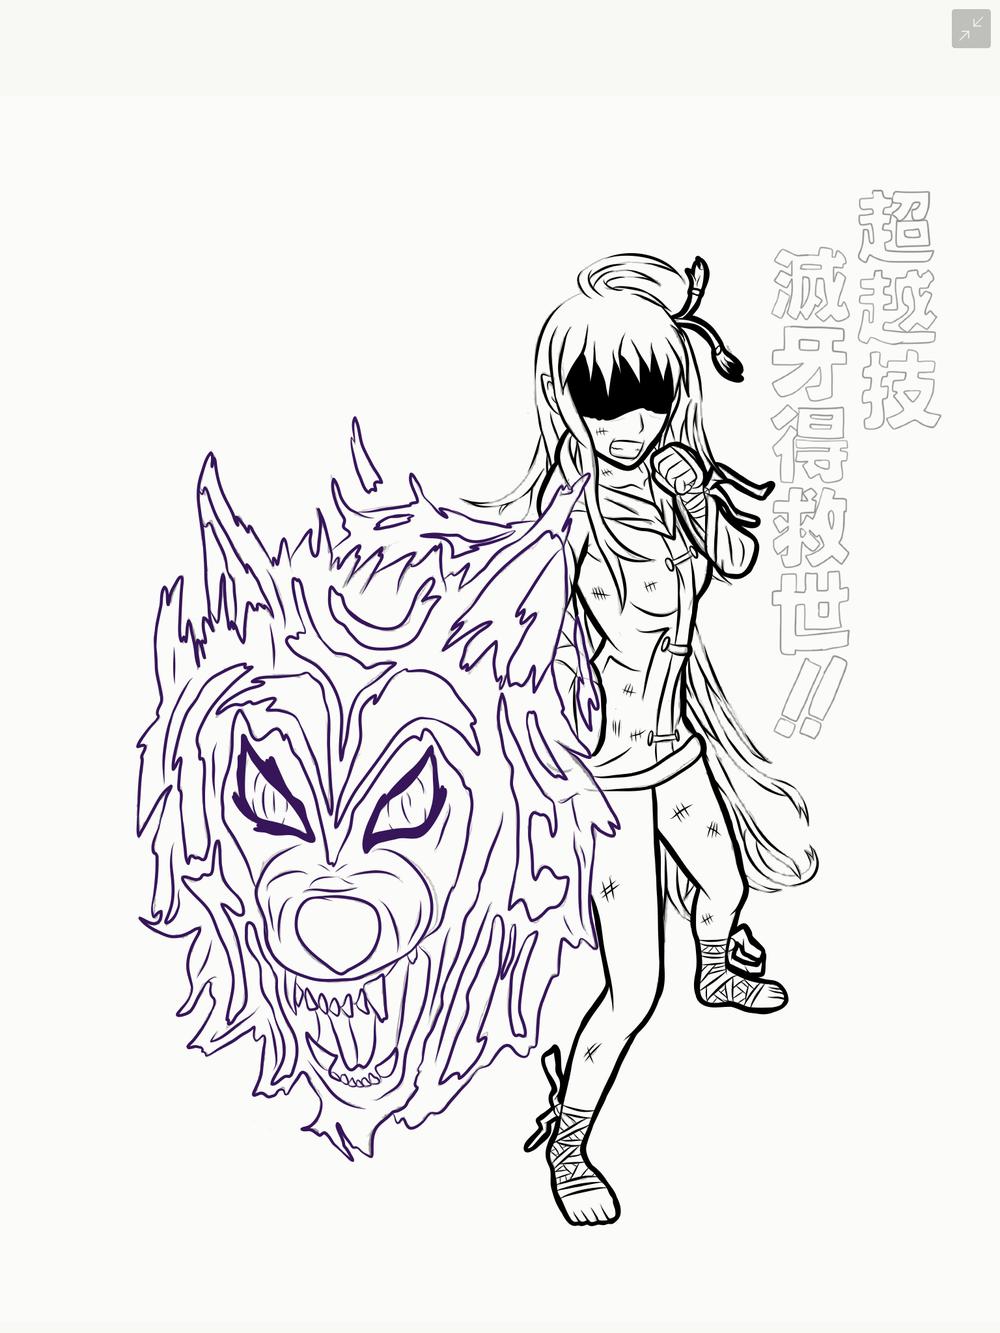 black-god-pop-art-process-image-2.png